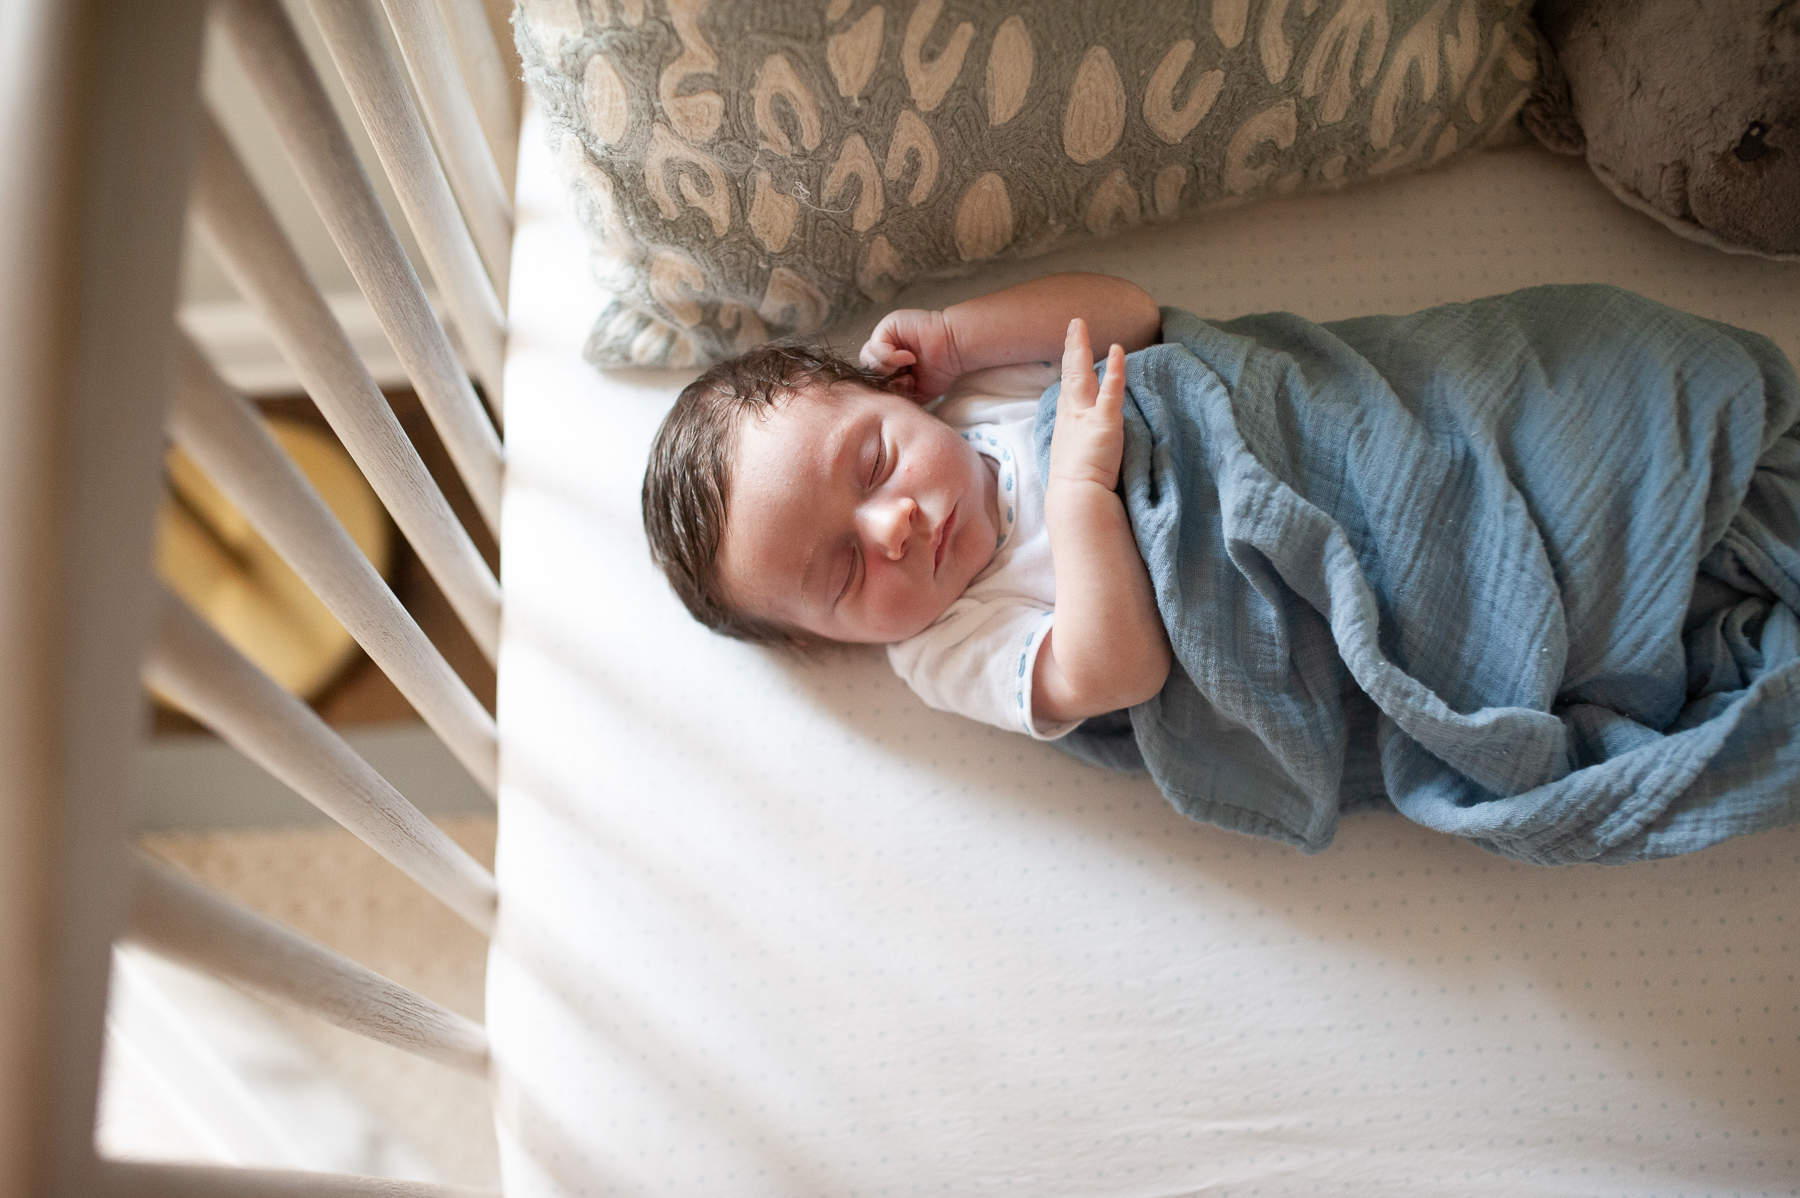 ClaireElisePhotography_Newborn-121.jpg